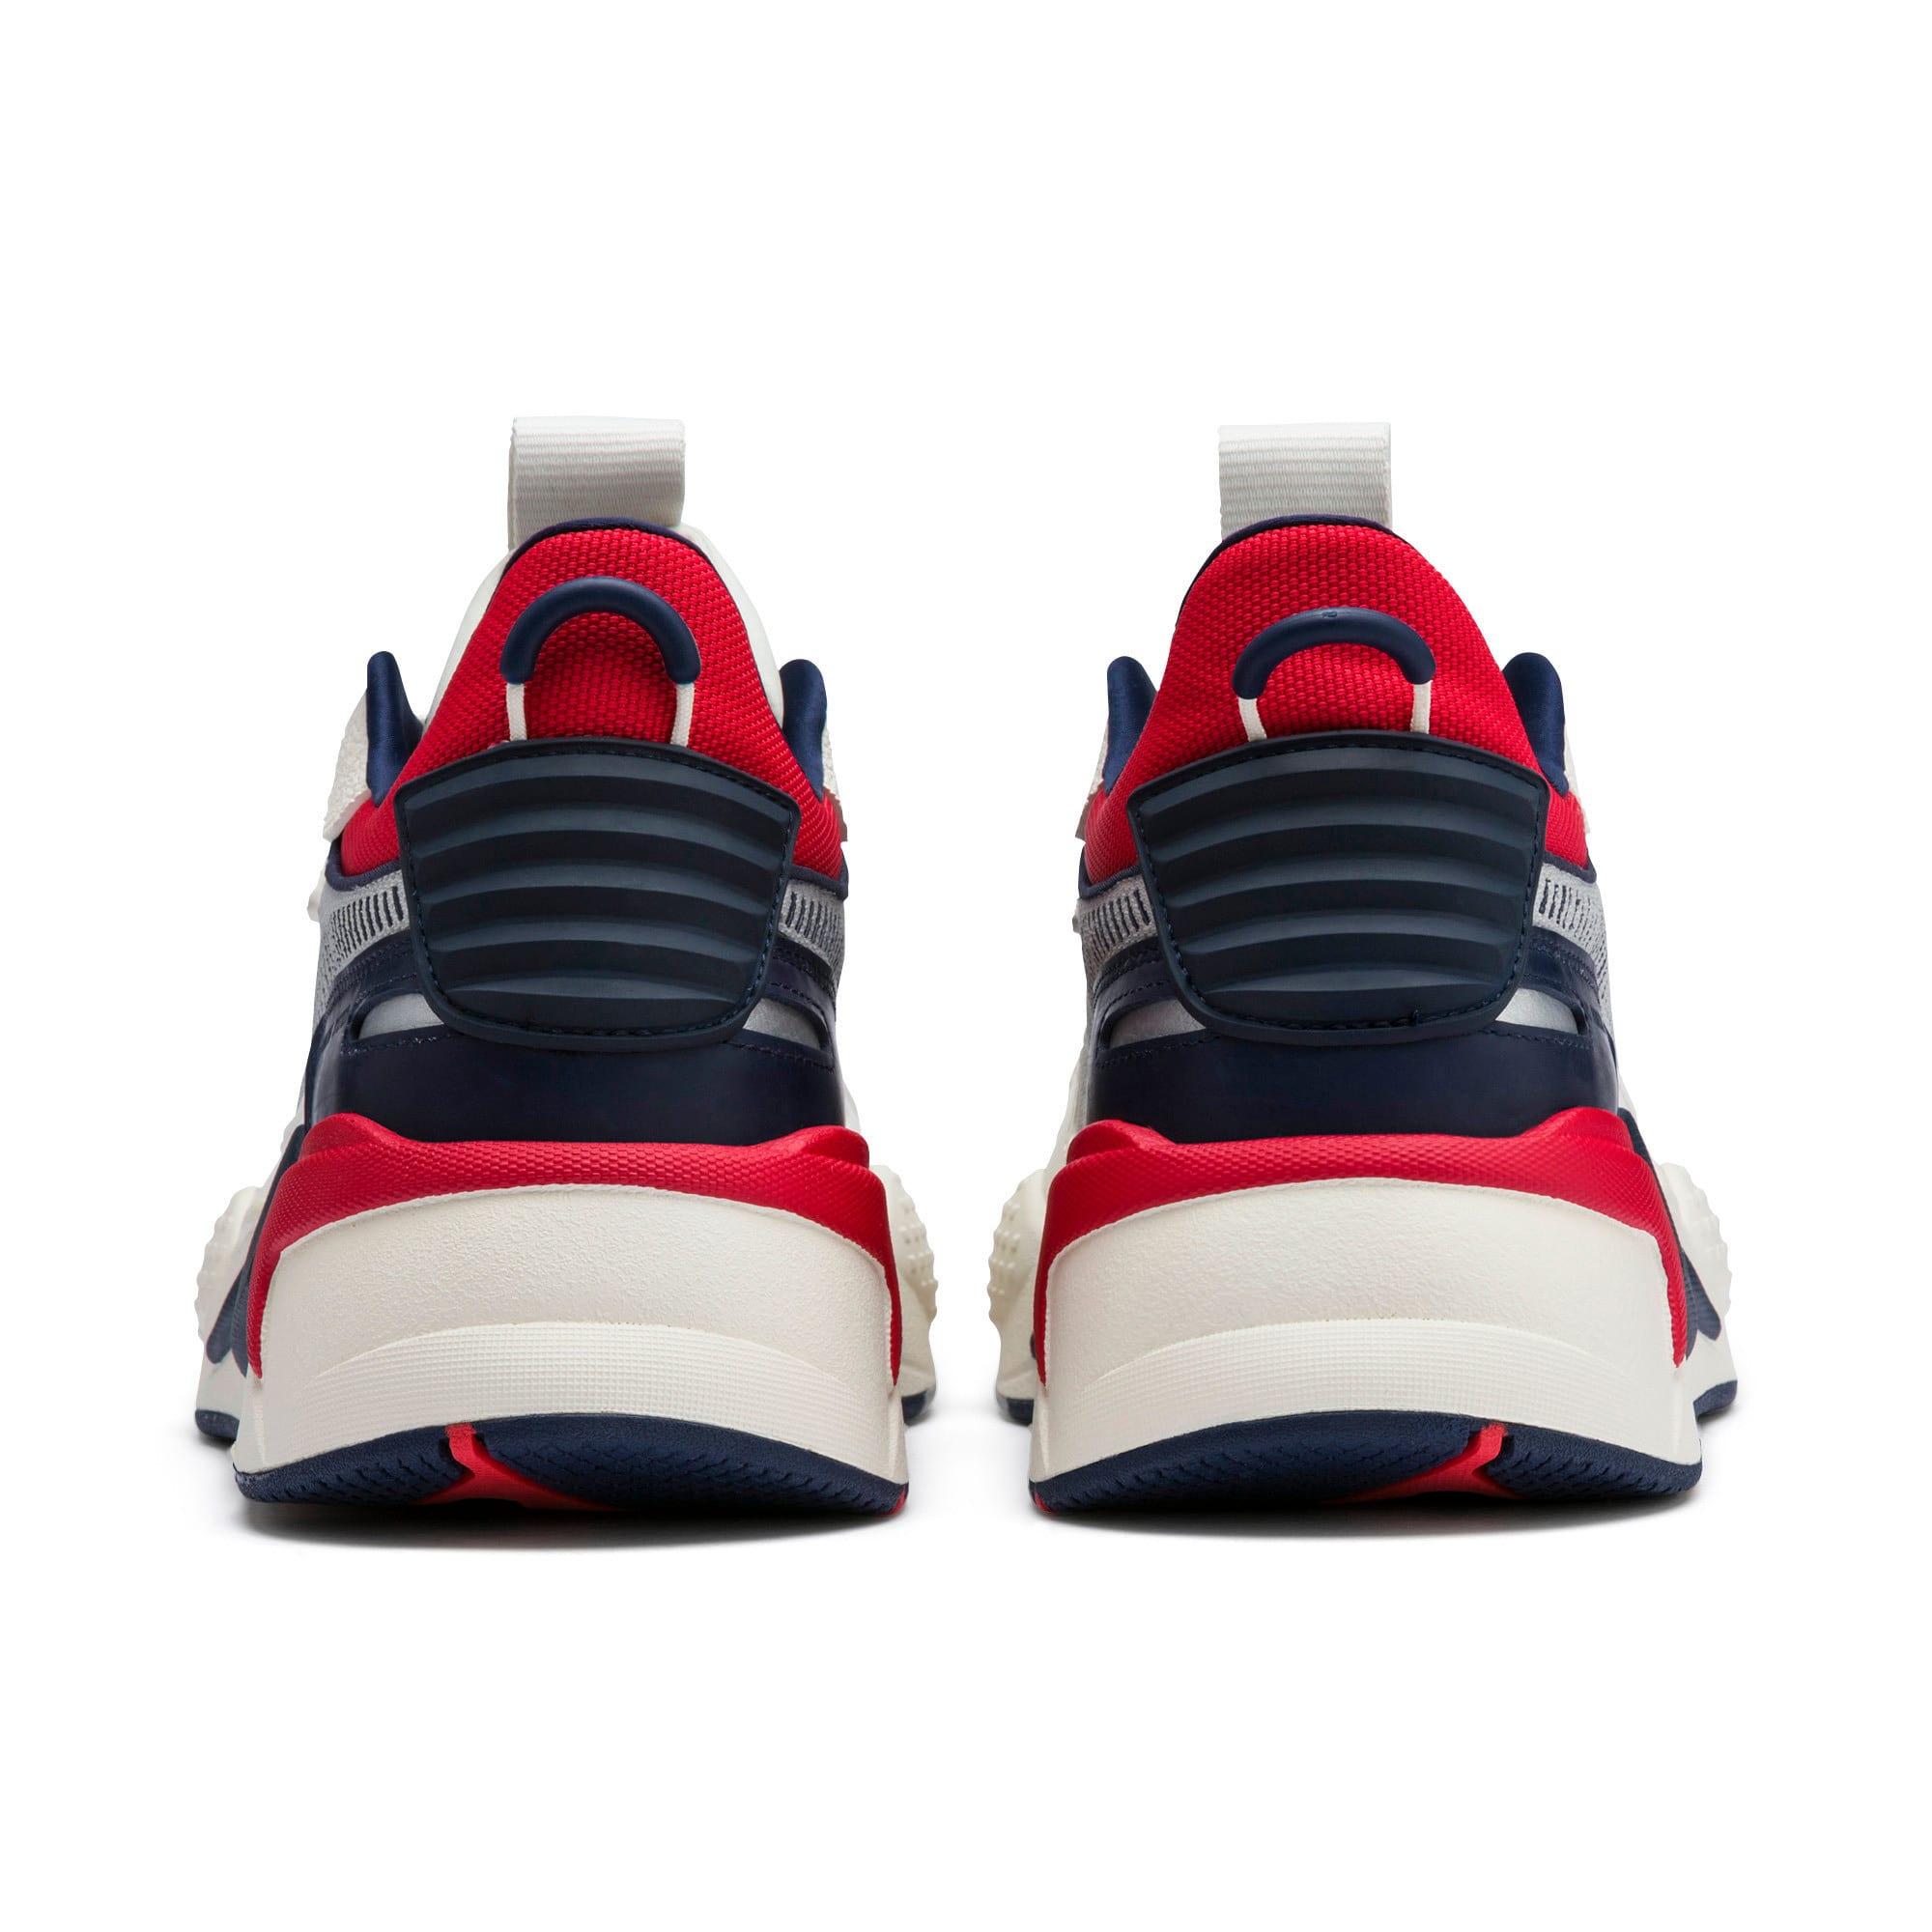 Thumbnail 4 of RS-X Hard Drive Sneaker, Whisper White-Peacoat, medium